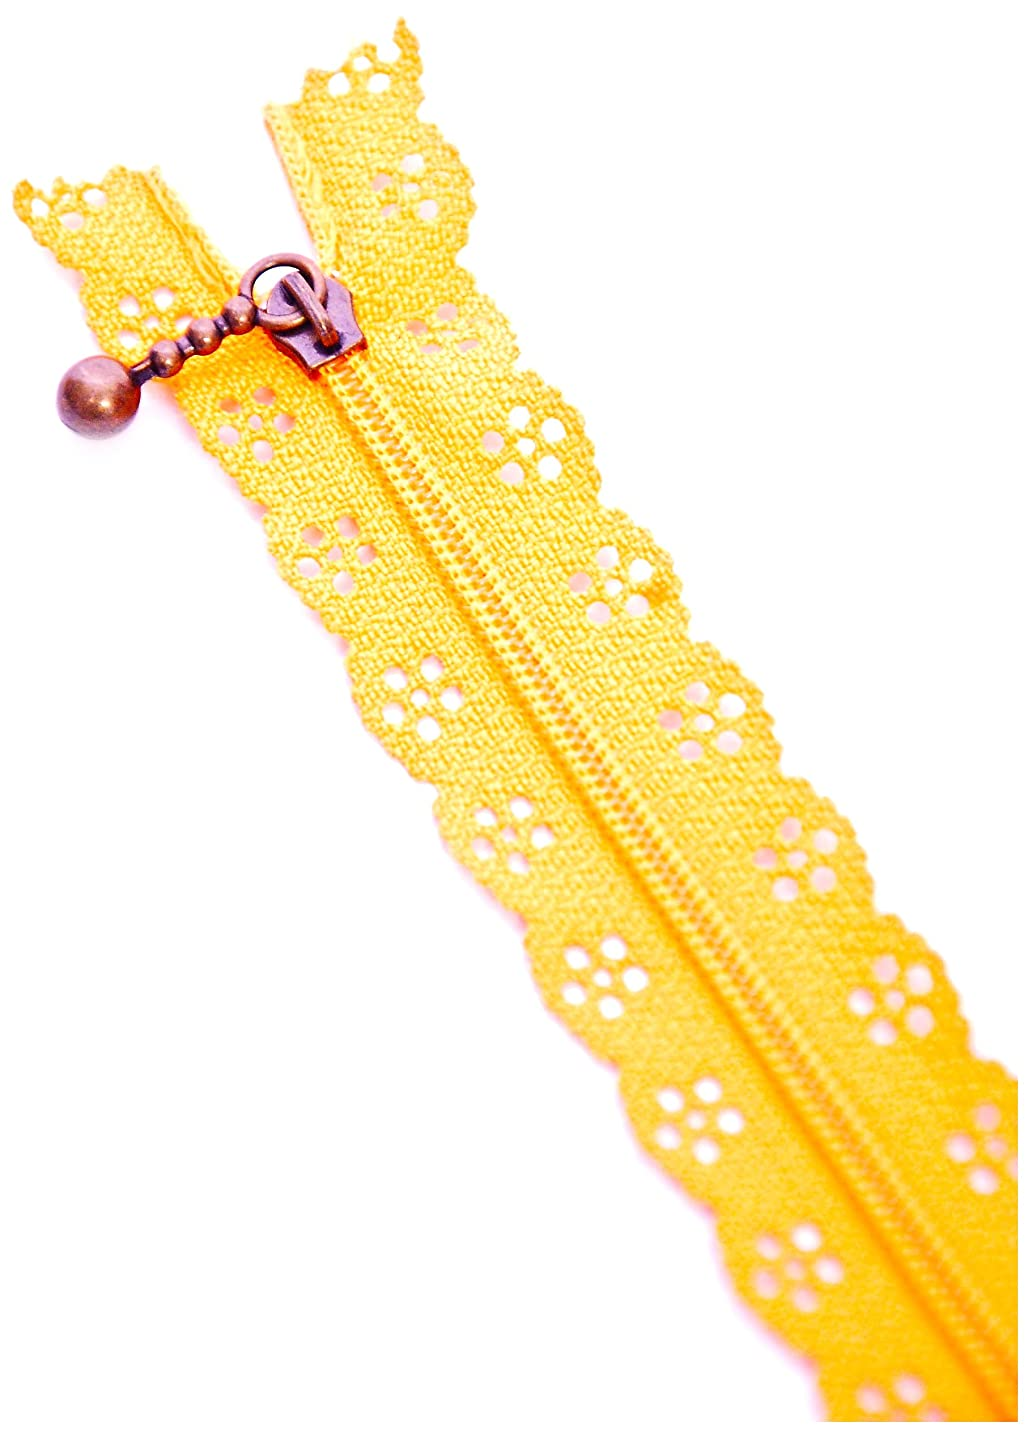 Button The Company 20 cm Nylon Lace Exposed Zip, Tangerine